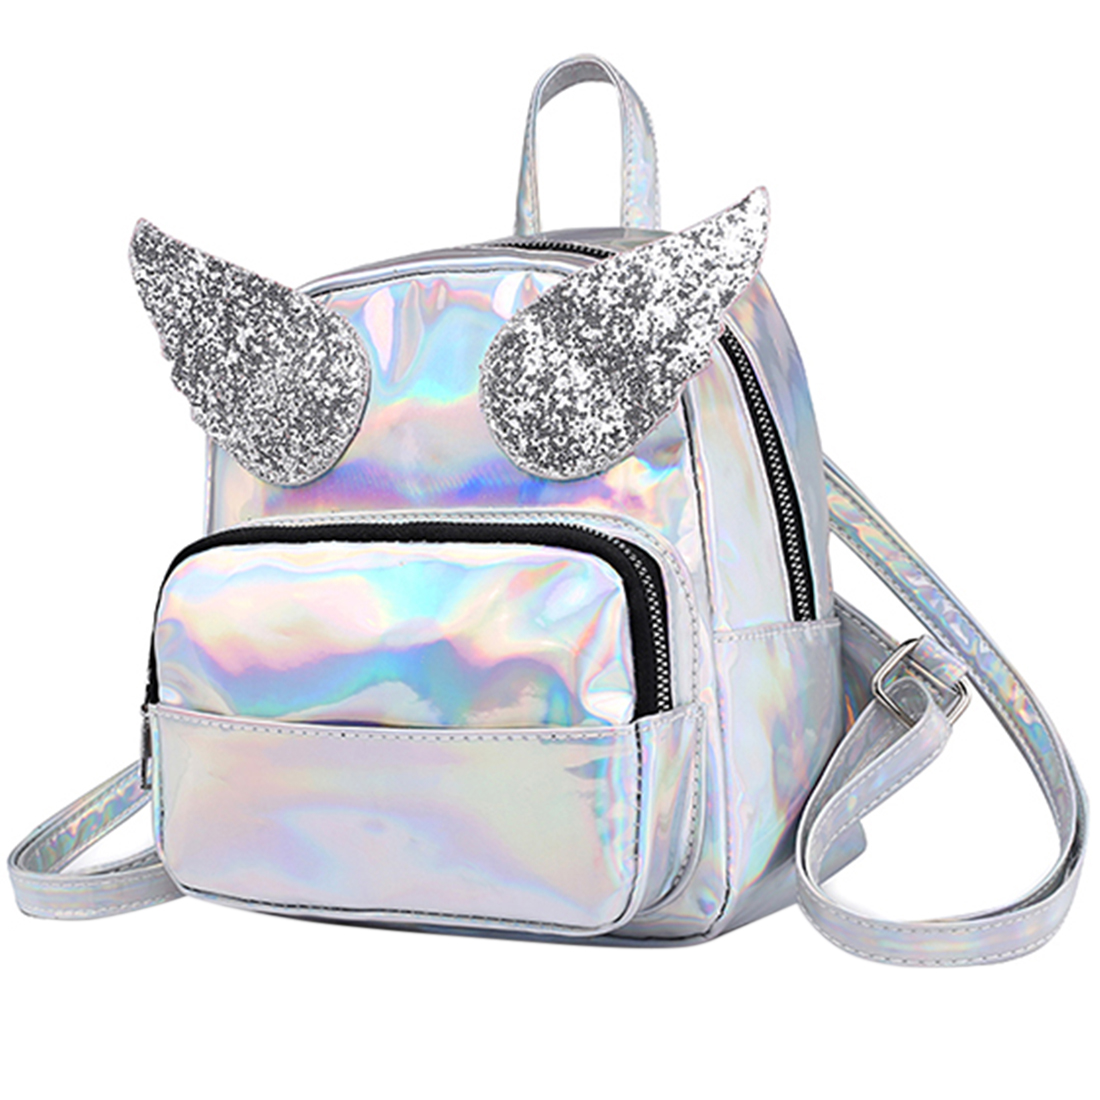 Luggage & Bags Backpacks Humble Female Hologram Laser Pu Leather Backpacks Beautiful Angel Wings Rucksack Girls Pure Color Shoulder Bags Large Capacity Backpack